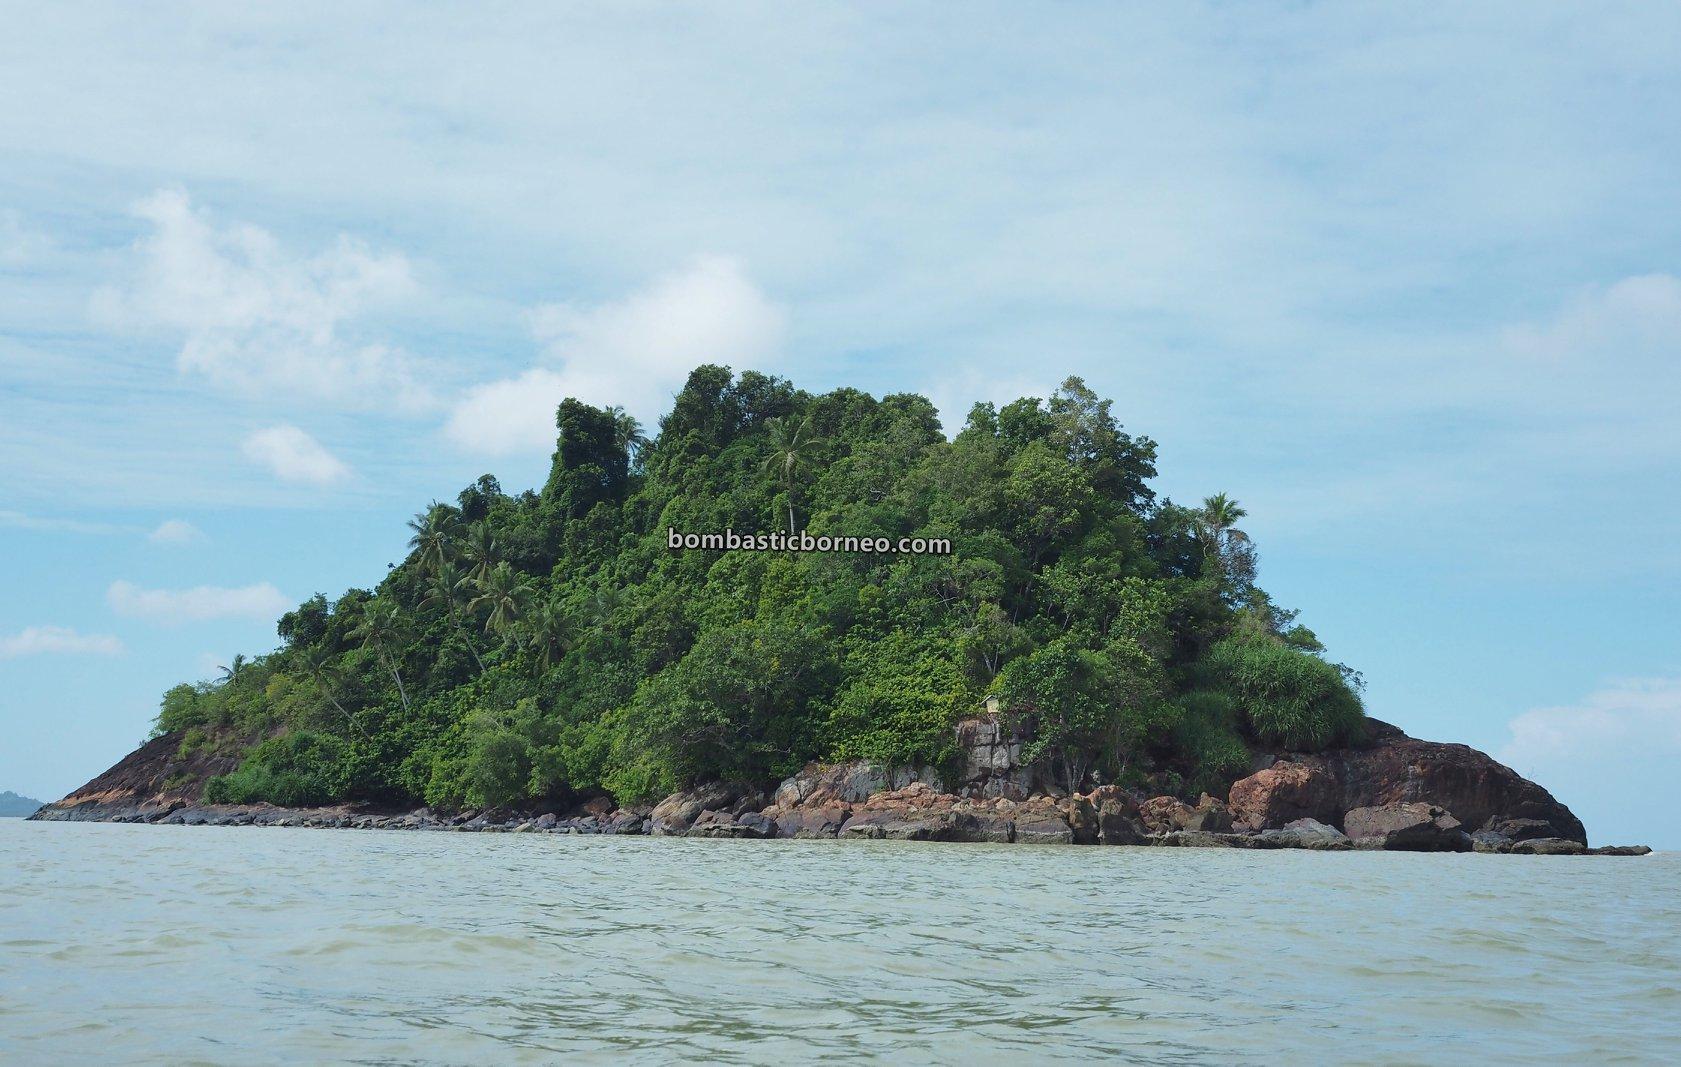 seafood, Kerang, clam, mussel, adventure, nature, Indonesia, wisata alam, Tourism, travel guide, destination, Trans Borneo, 穿越婆罗洲游踪, 印尼西加里曼丹, 三发马来渔村